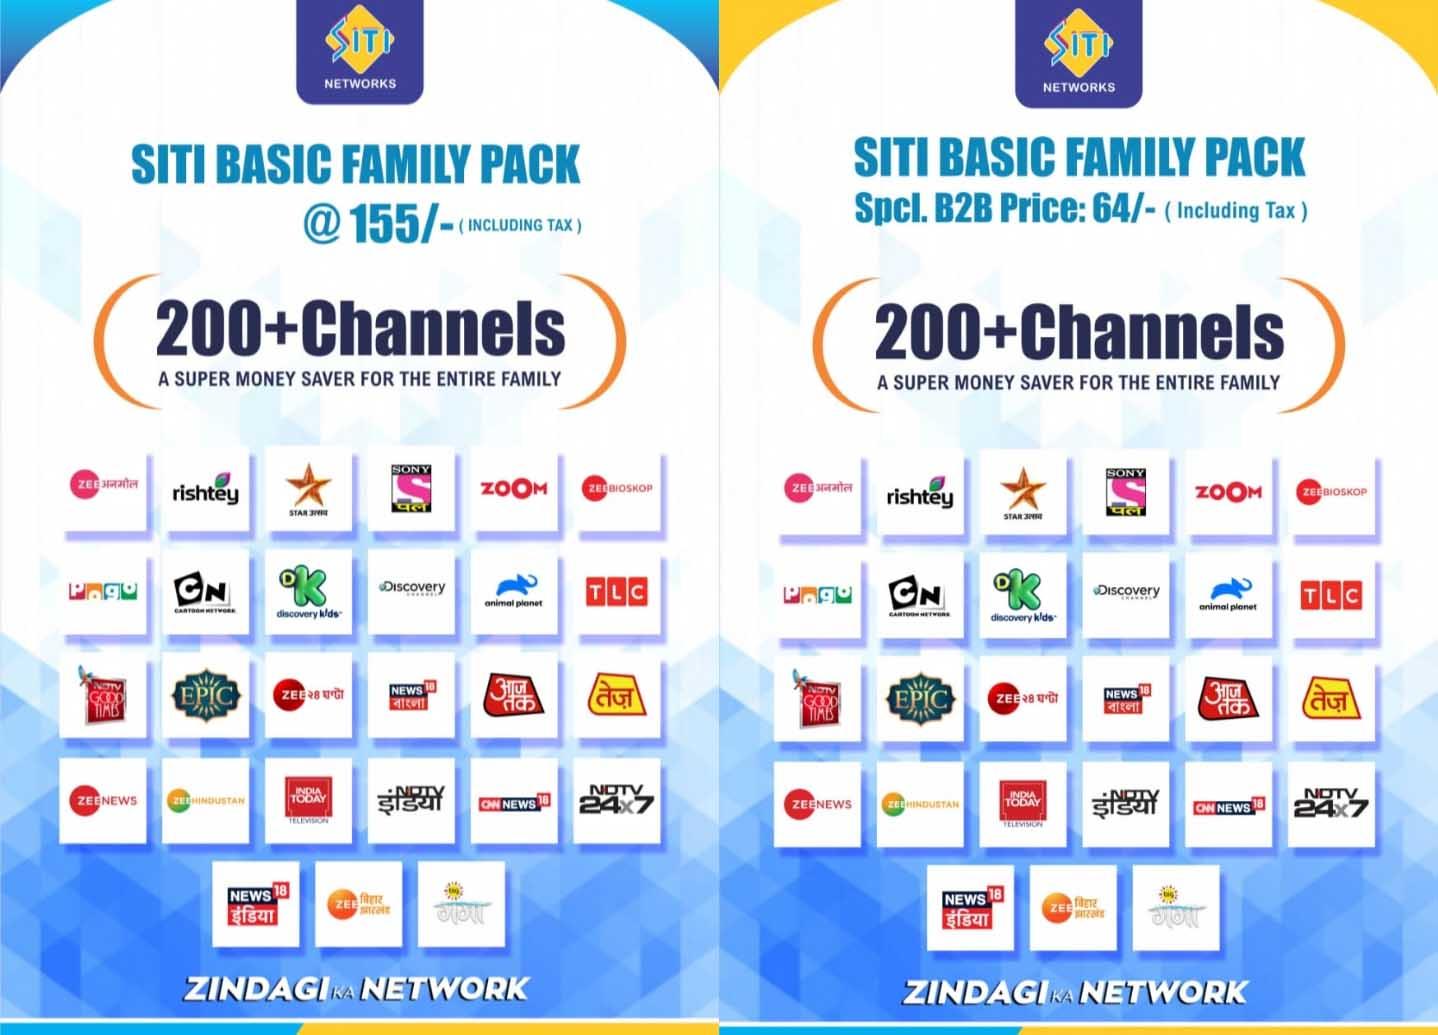 Siti Basic Family Pack